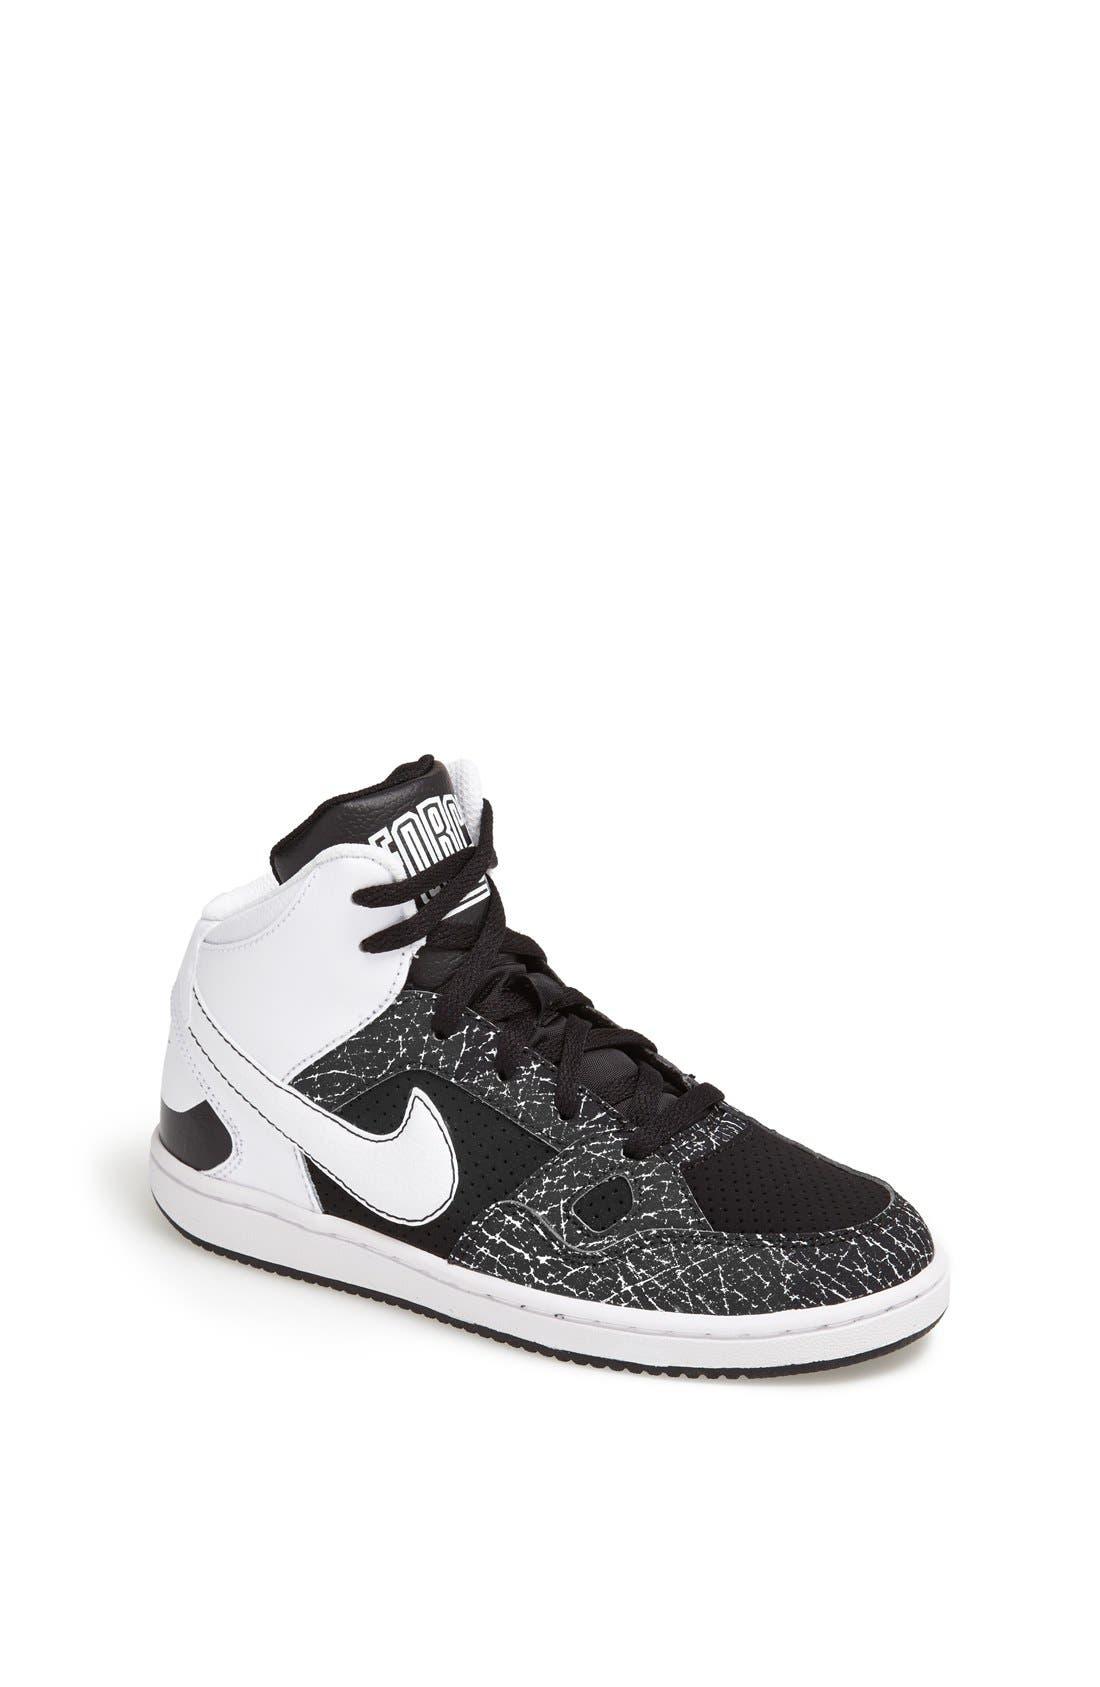 Main Image - Nike 'Son of Force' Sneaker (Toddler & Little Kid)